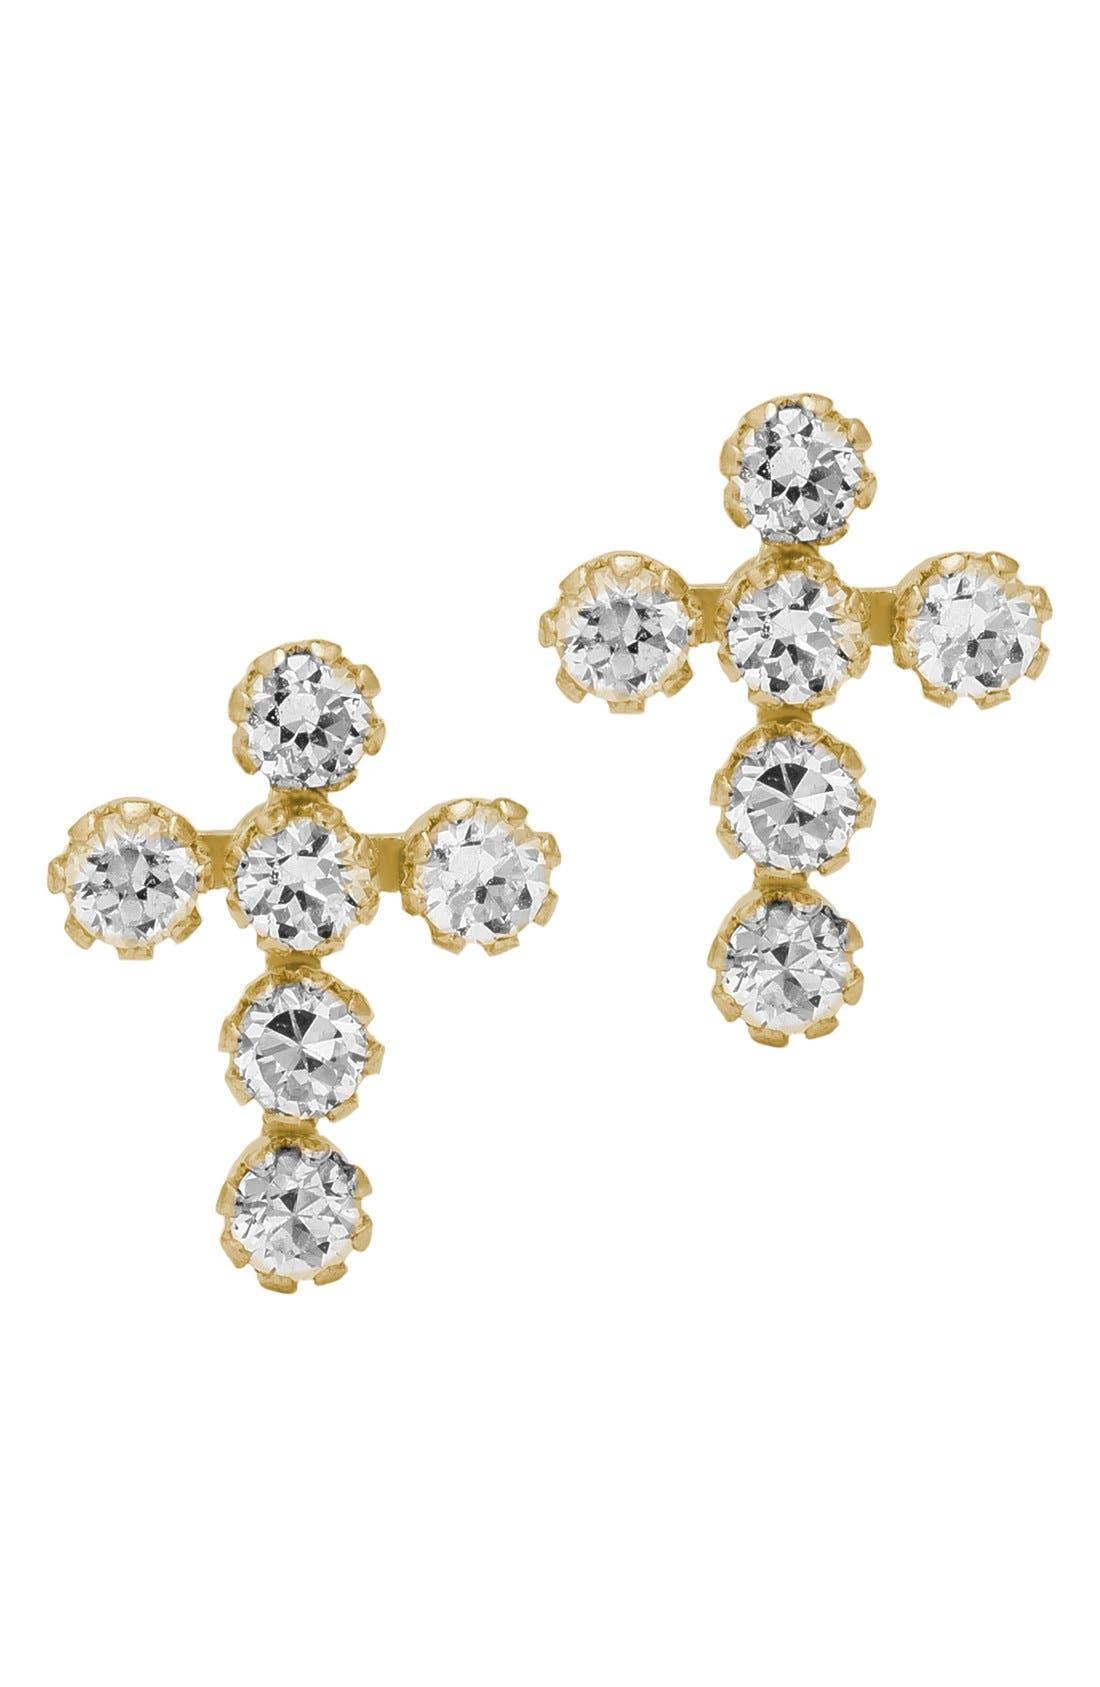 14k Gold & Cubic Zirconia Cross Earrings,                             Main thumbnail 1, color,                             GOLD